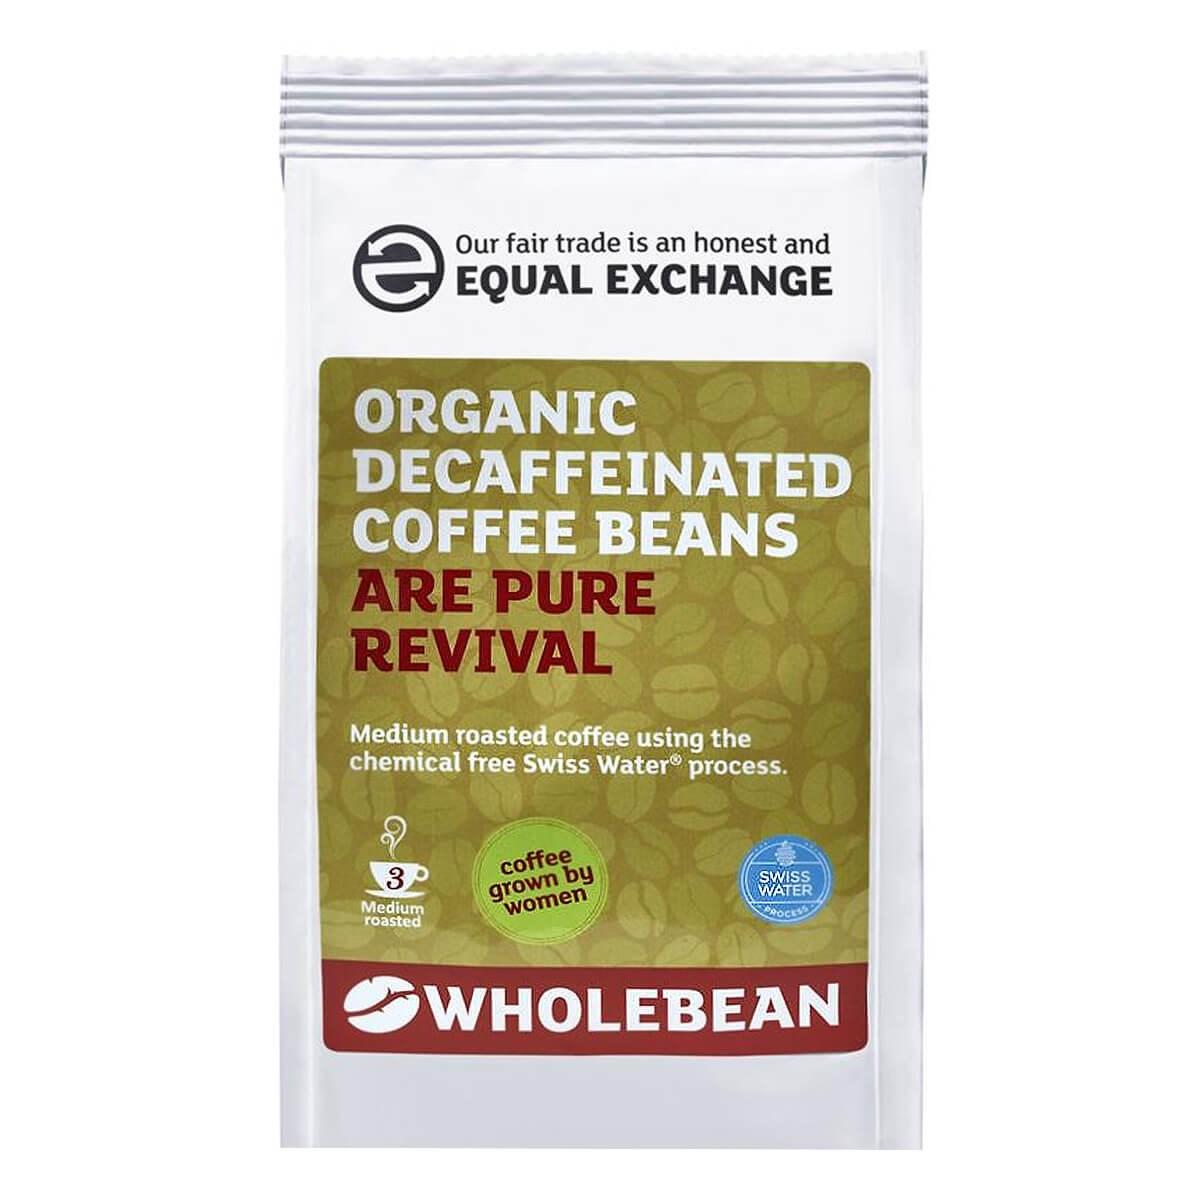 Equal Exchange Organic Fairtrade Decaffeinated Coffee Beans - Swiss Water